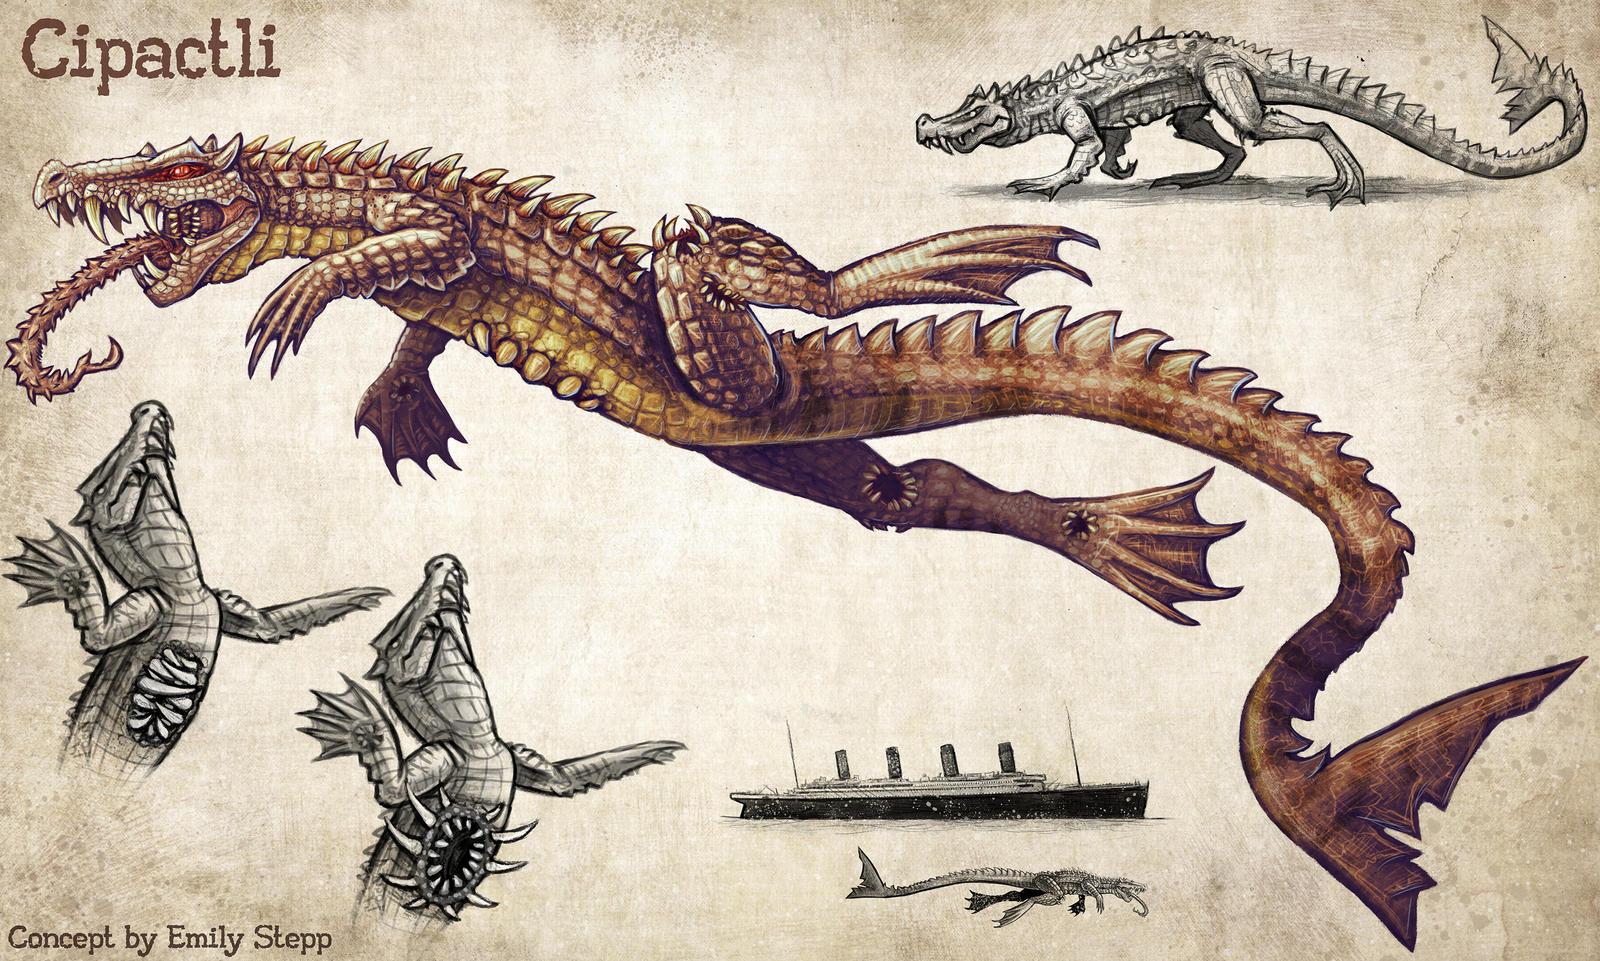 Cipactli Creature Concept by EmilyStepp